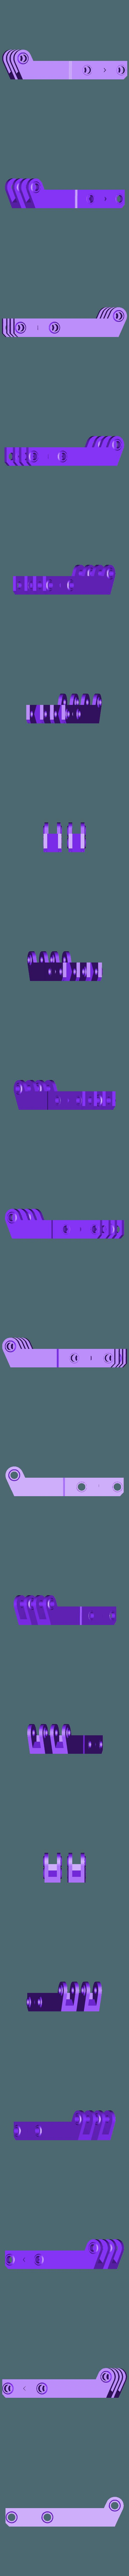 modif_serre_joint2.obj Download free OBJ file serre joint remix • 3D printer design, Cyborg